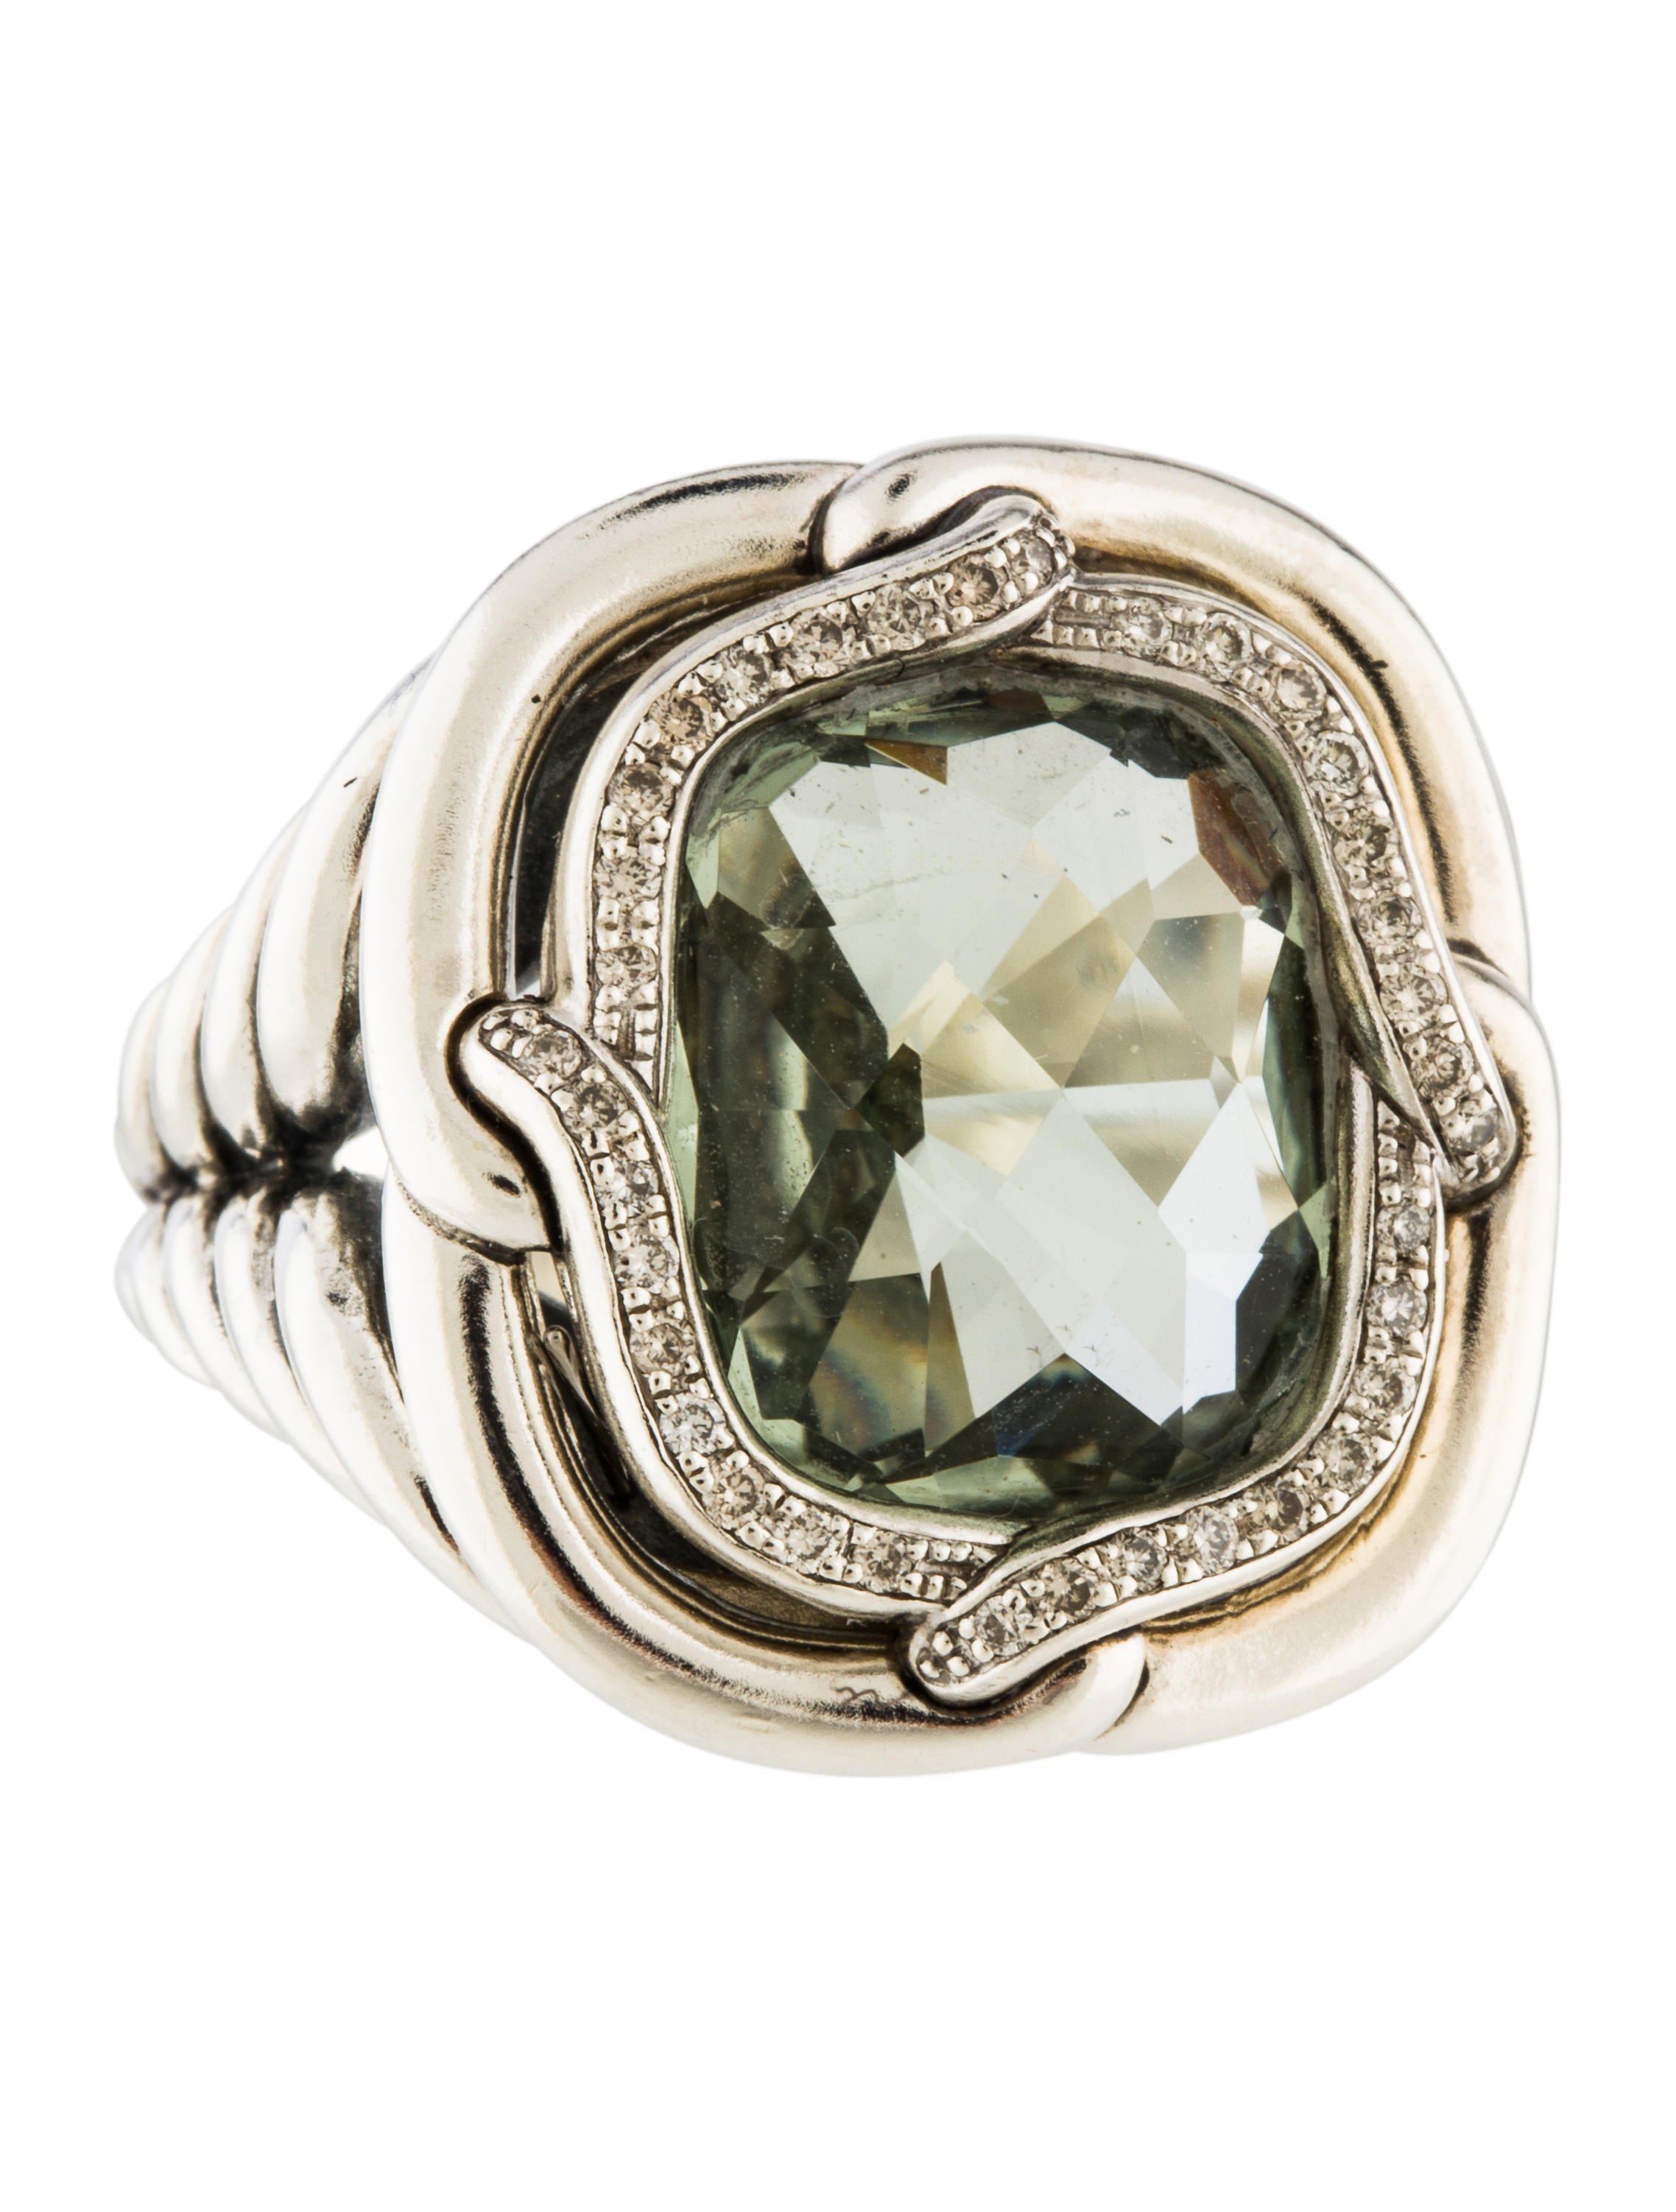 David yurman prasiolite diamond labyrinth ring rings for David yurman inspired jewelry rings